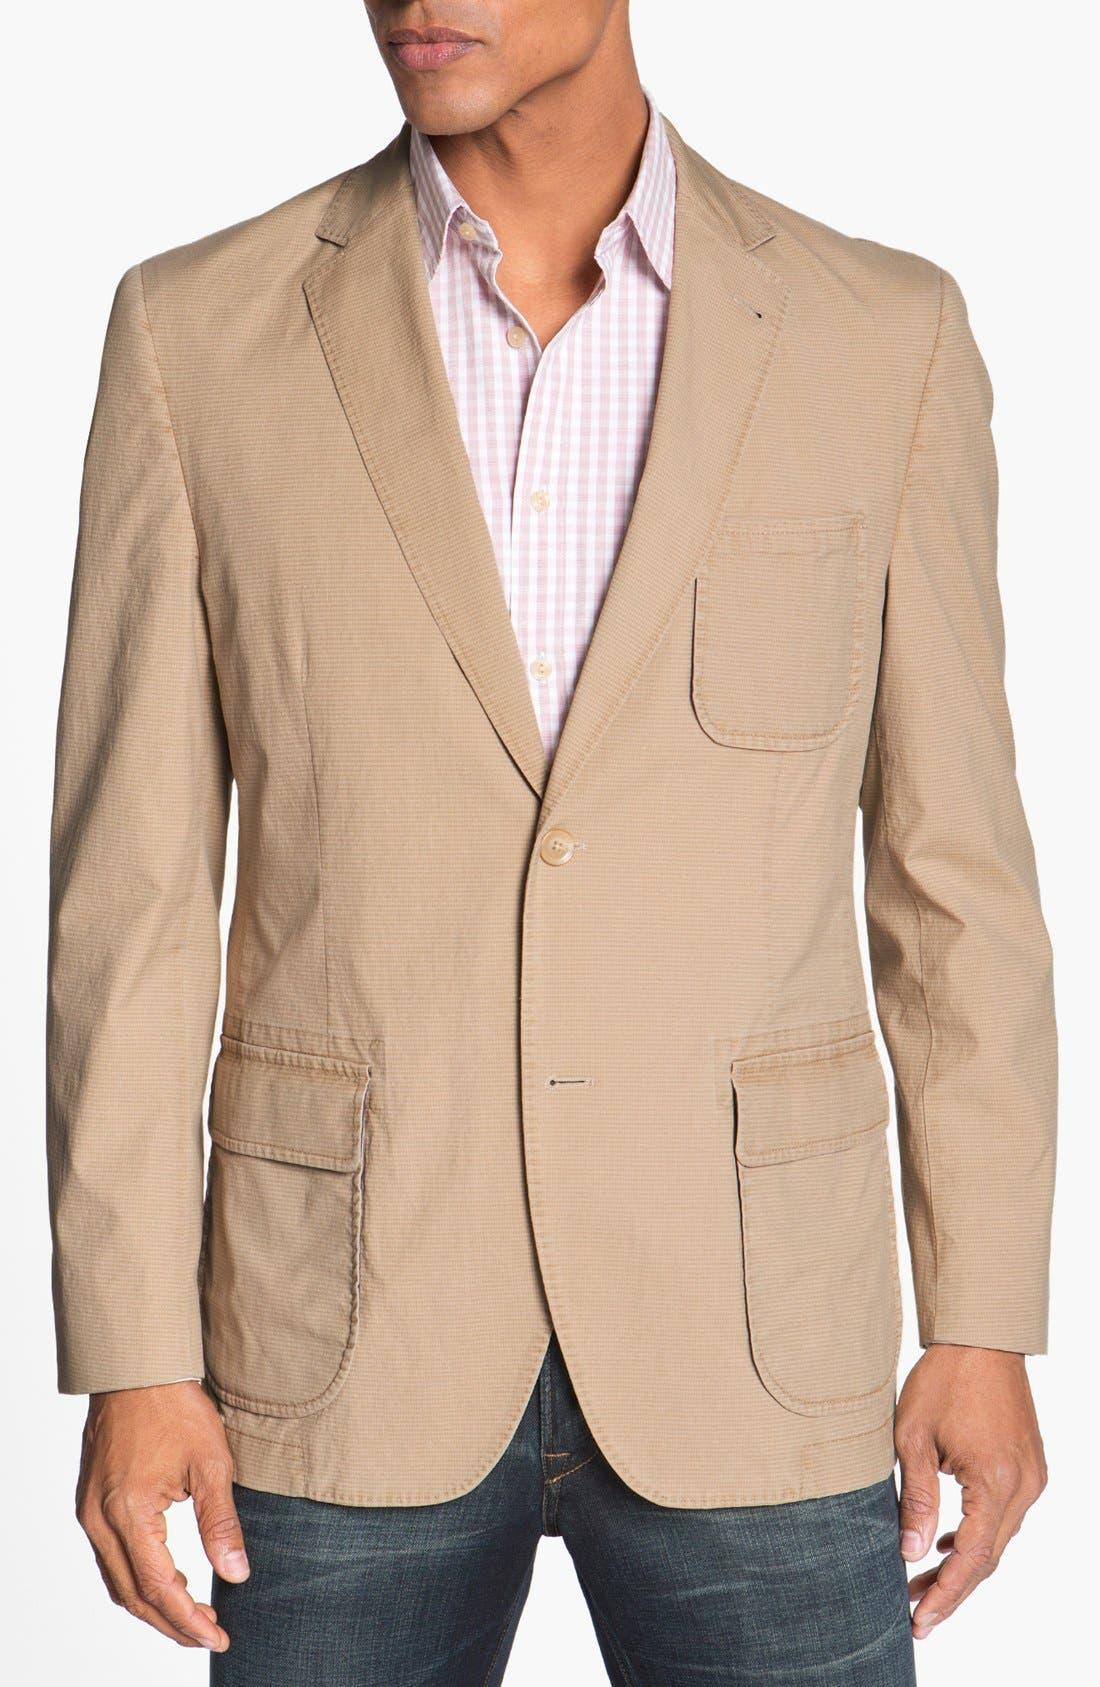 Alternate Image 1 Selected - Kroon 'Harrison' Cotton Blend Sportcoat